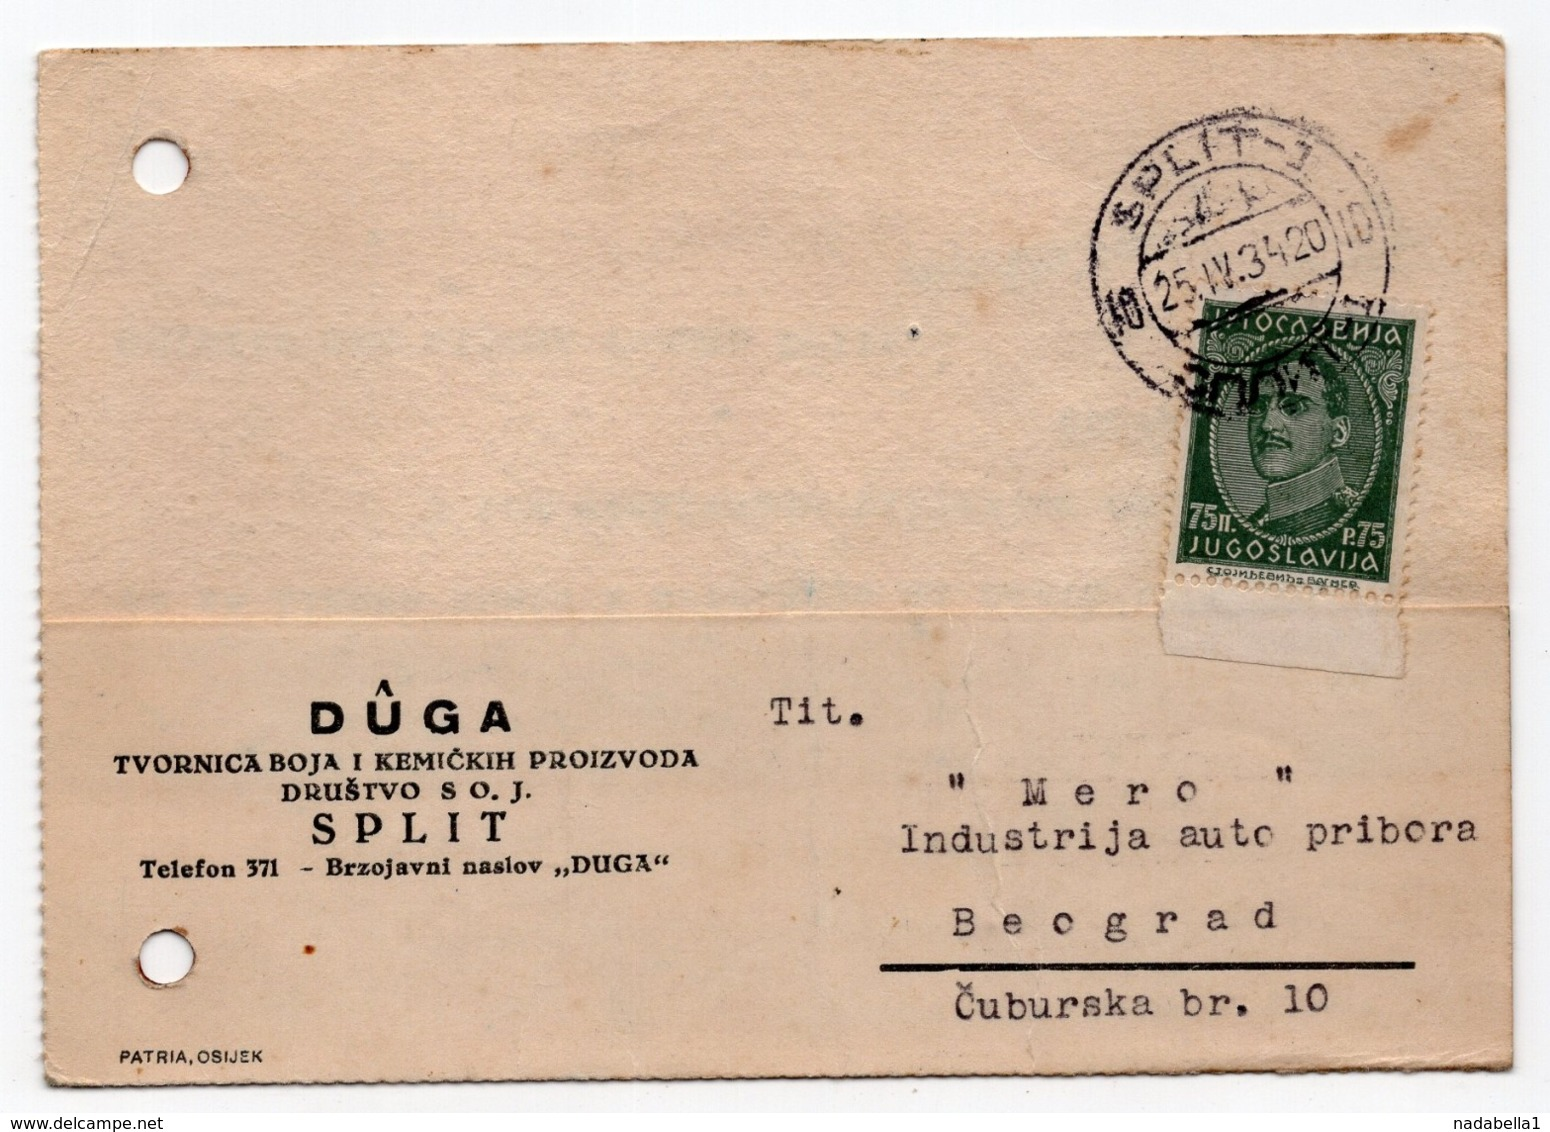 1934 YUGOSLAVIA, CROATIA, SPLIT TO BELGRADE, CORRESPONDENCE CARD, DUGA, CHEMICAL INDUSTRY - Covers & Documents